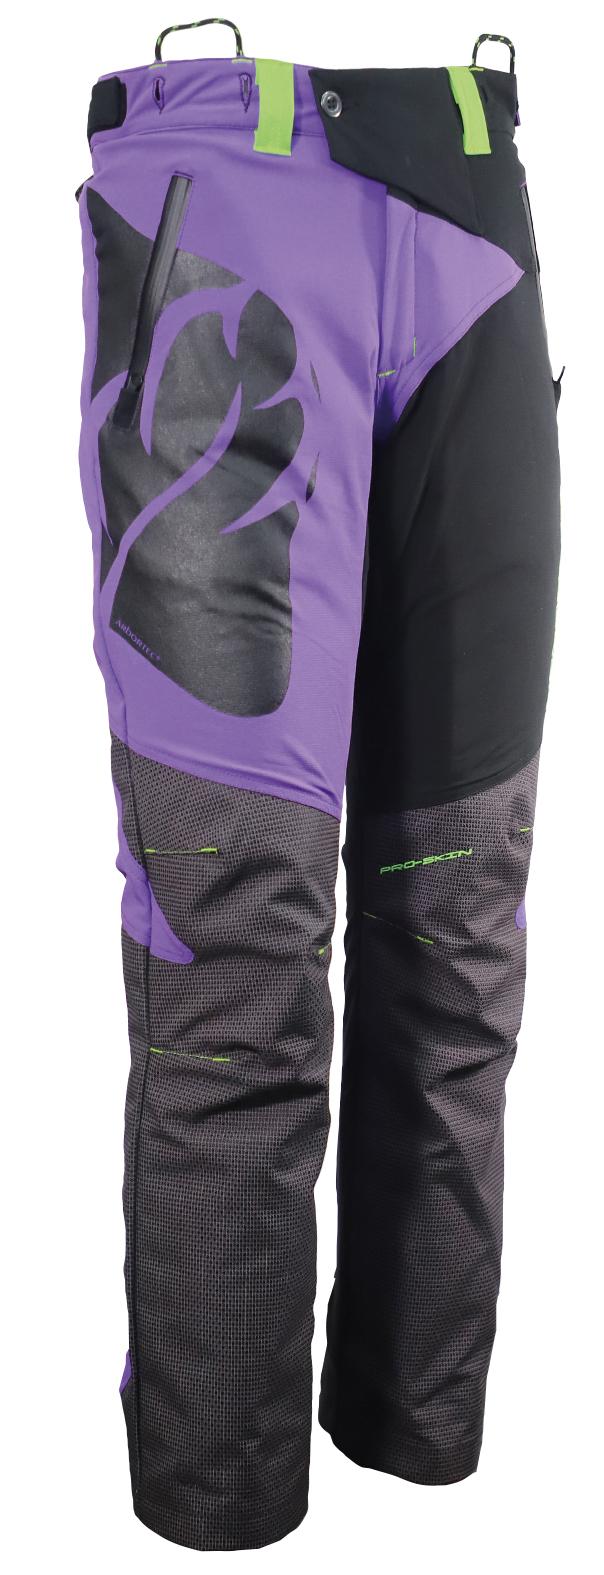 ARBORTEC Arborflex Chainsaw Pants